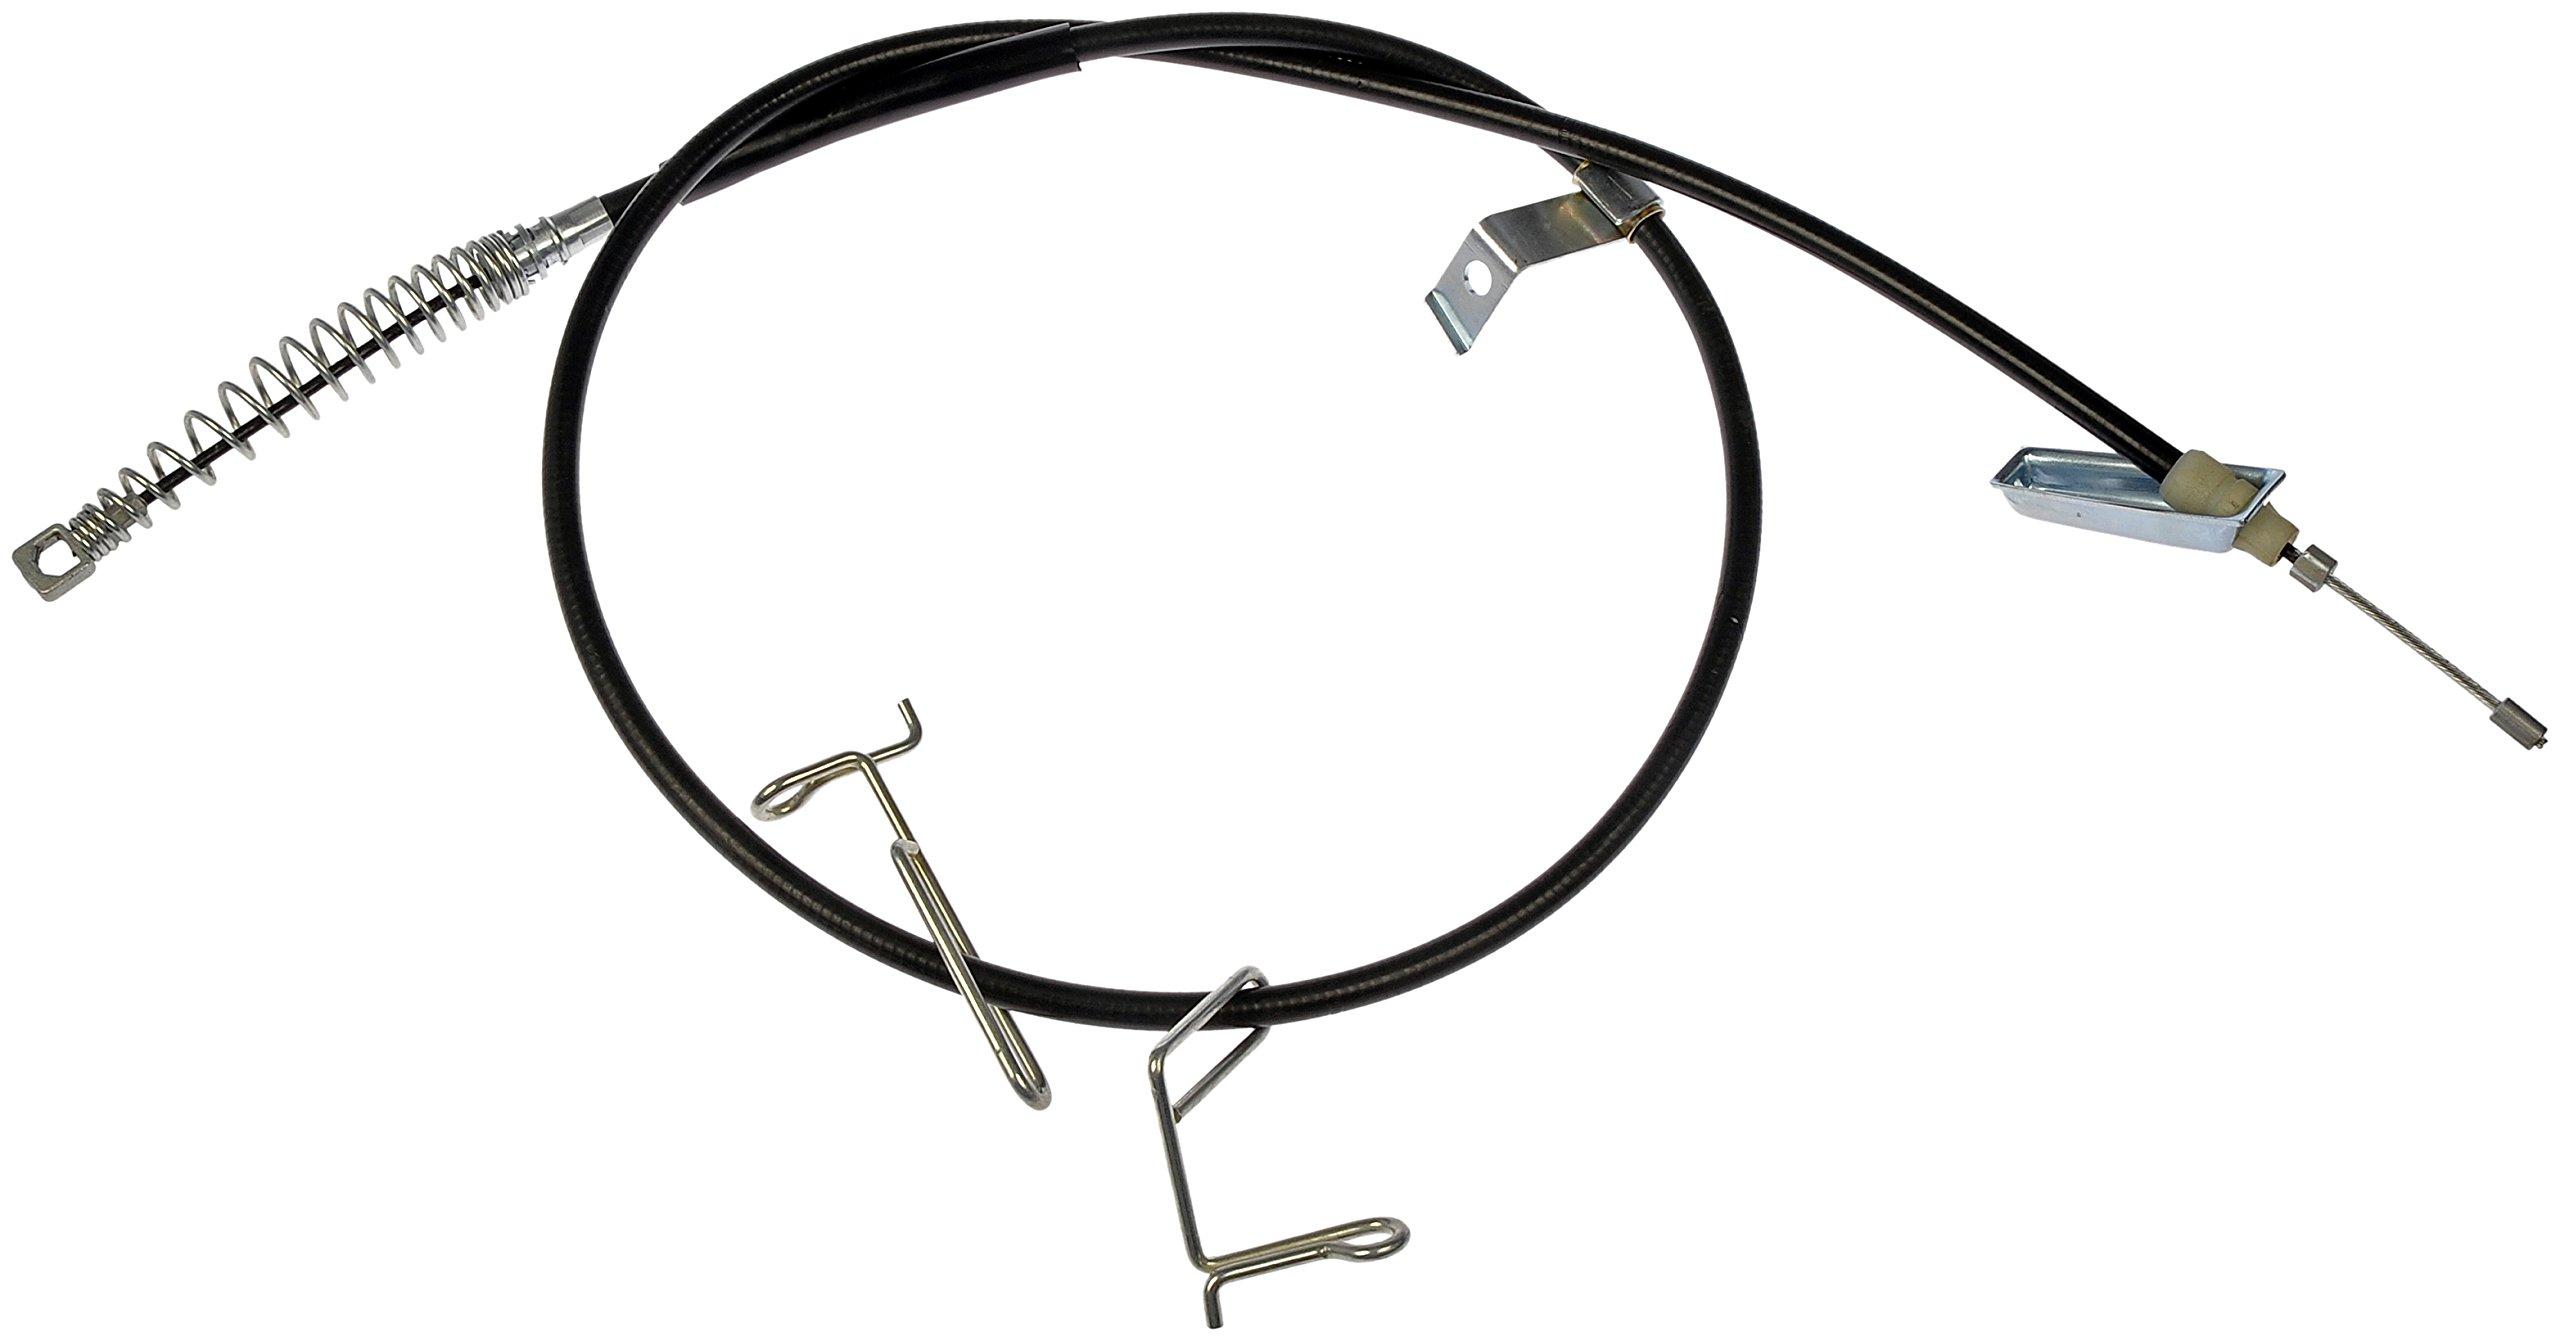 Dorman C660560 Parking Brake Cable